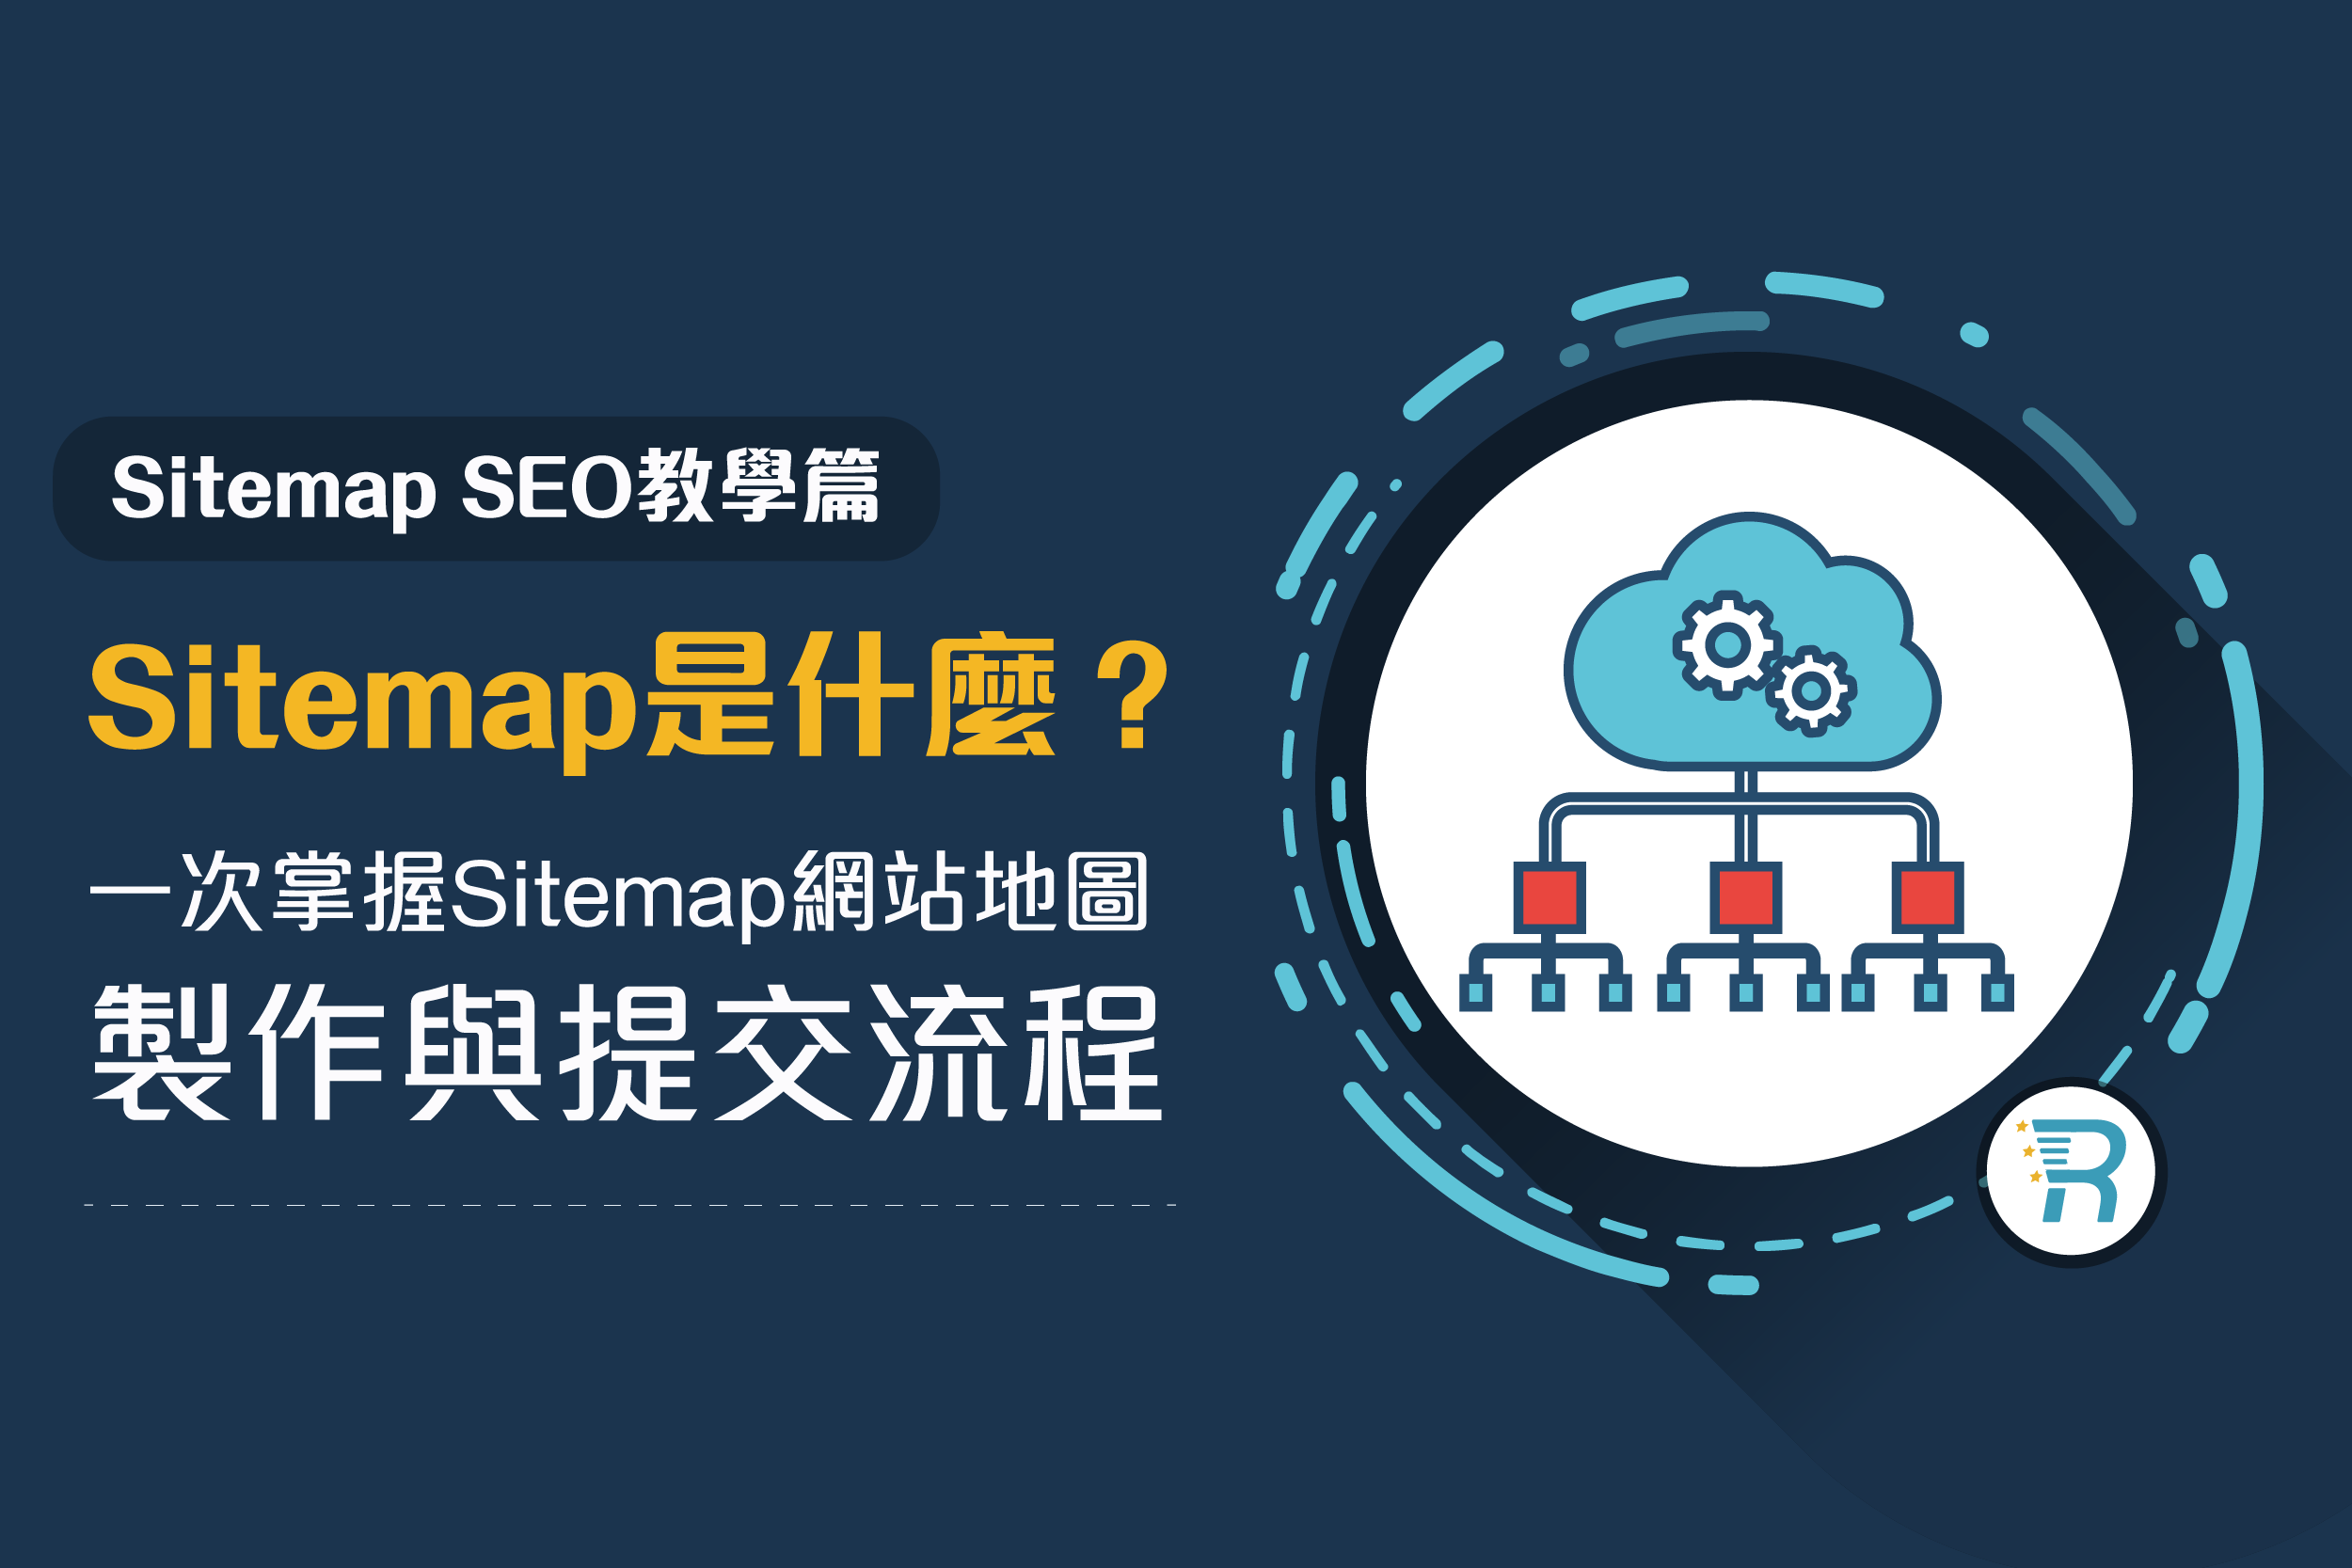 【Sitemap SEO教學篇】Sitemap是什麼?一次掌握Sitemap網站地圖製作與提交流程!